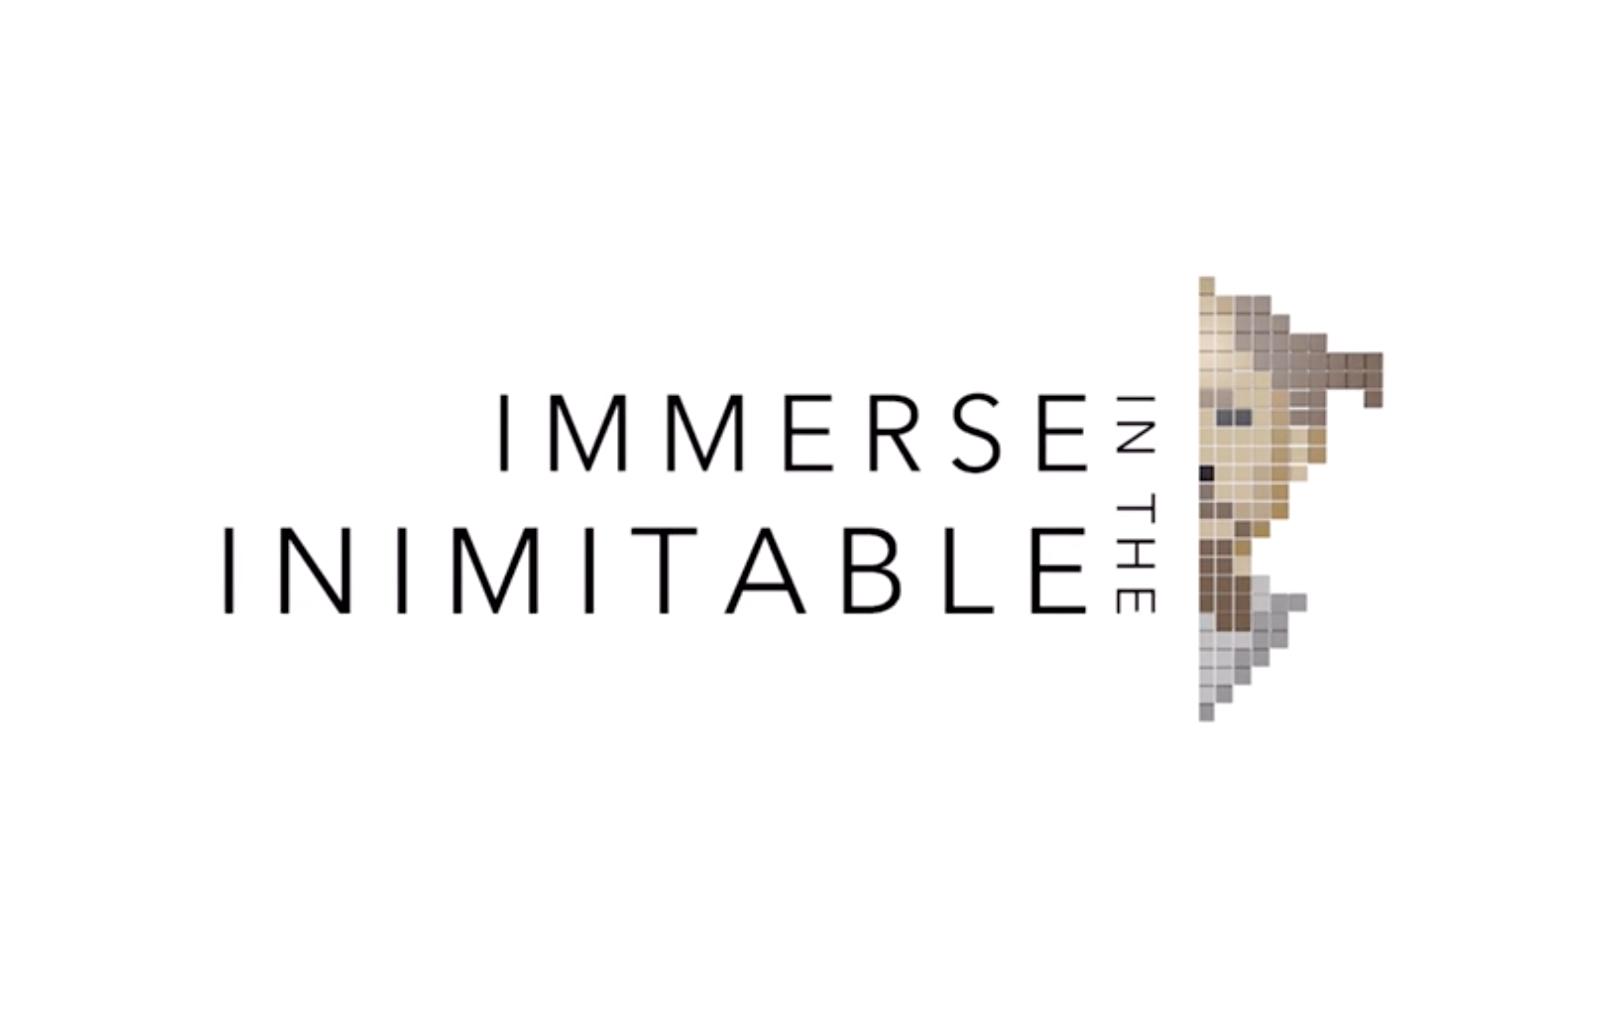 Immerse In the Inimitable_Ranga_portfolio